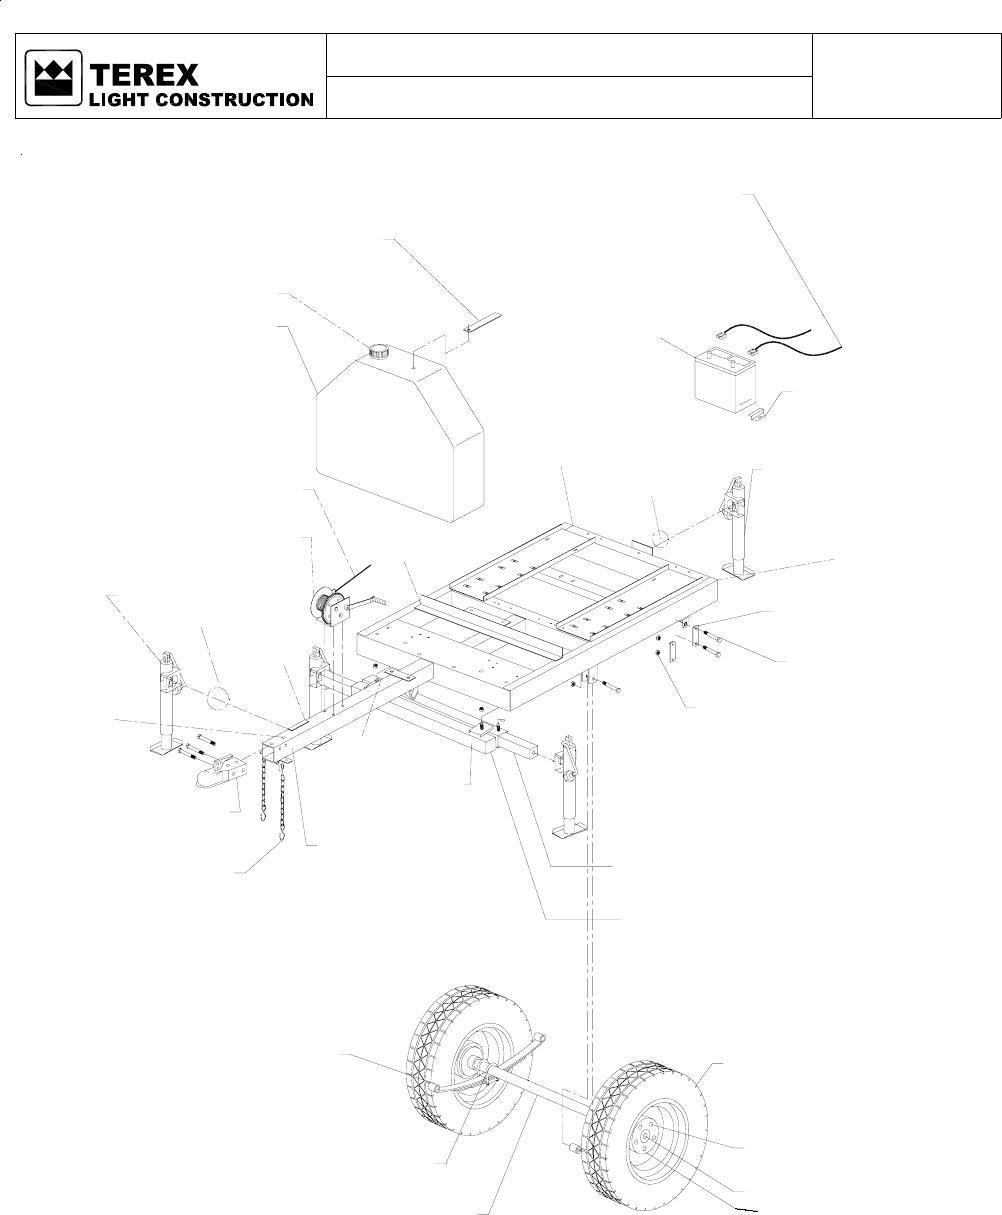 Terex Light Tower Service Manual